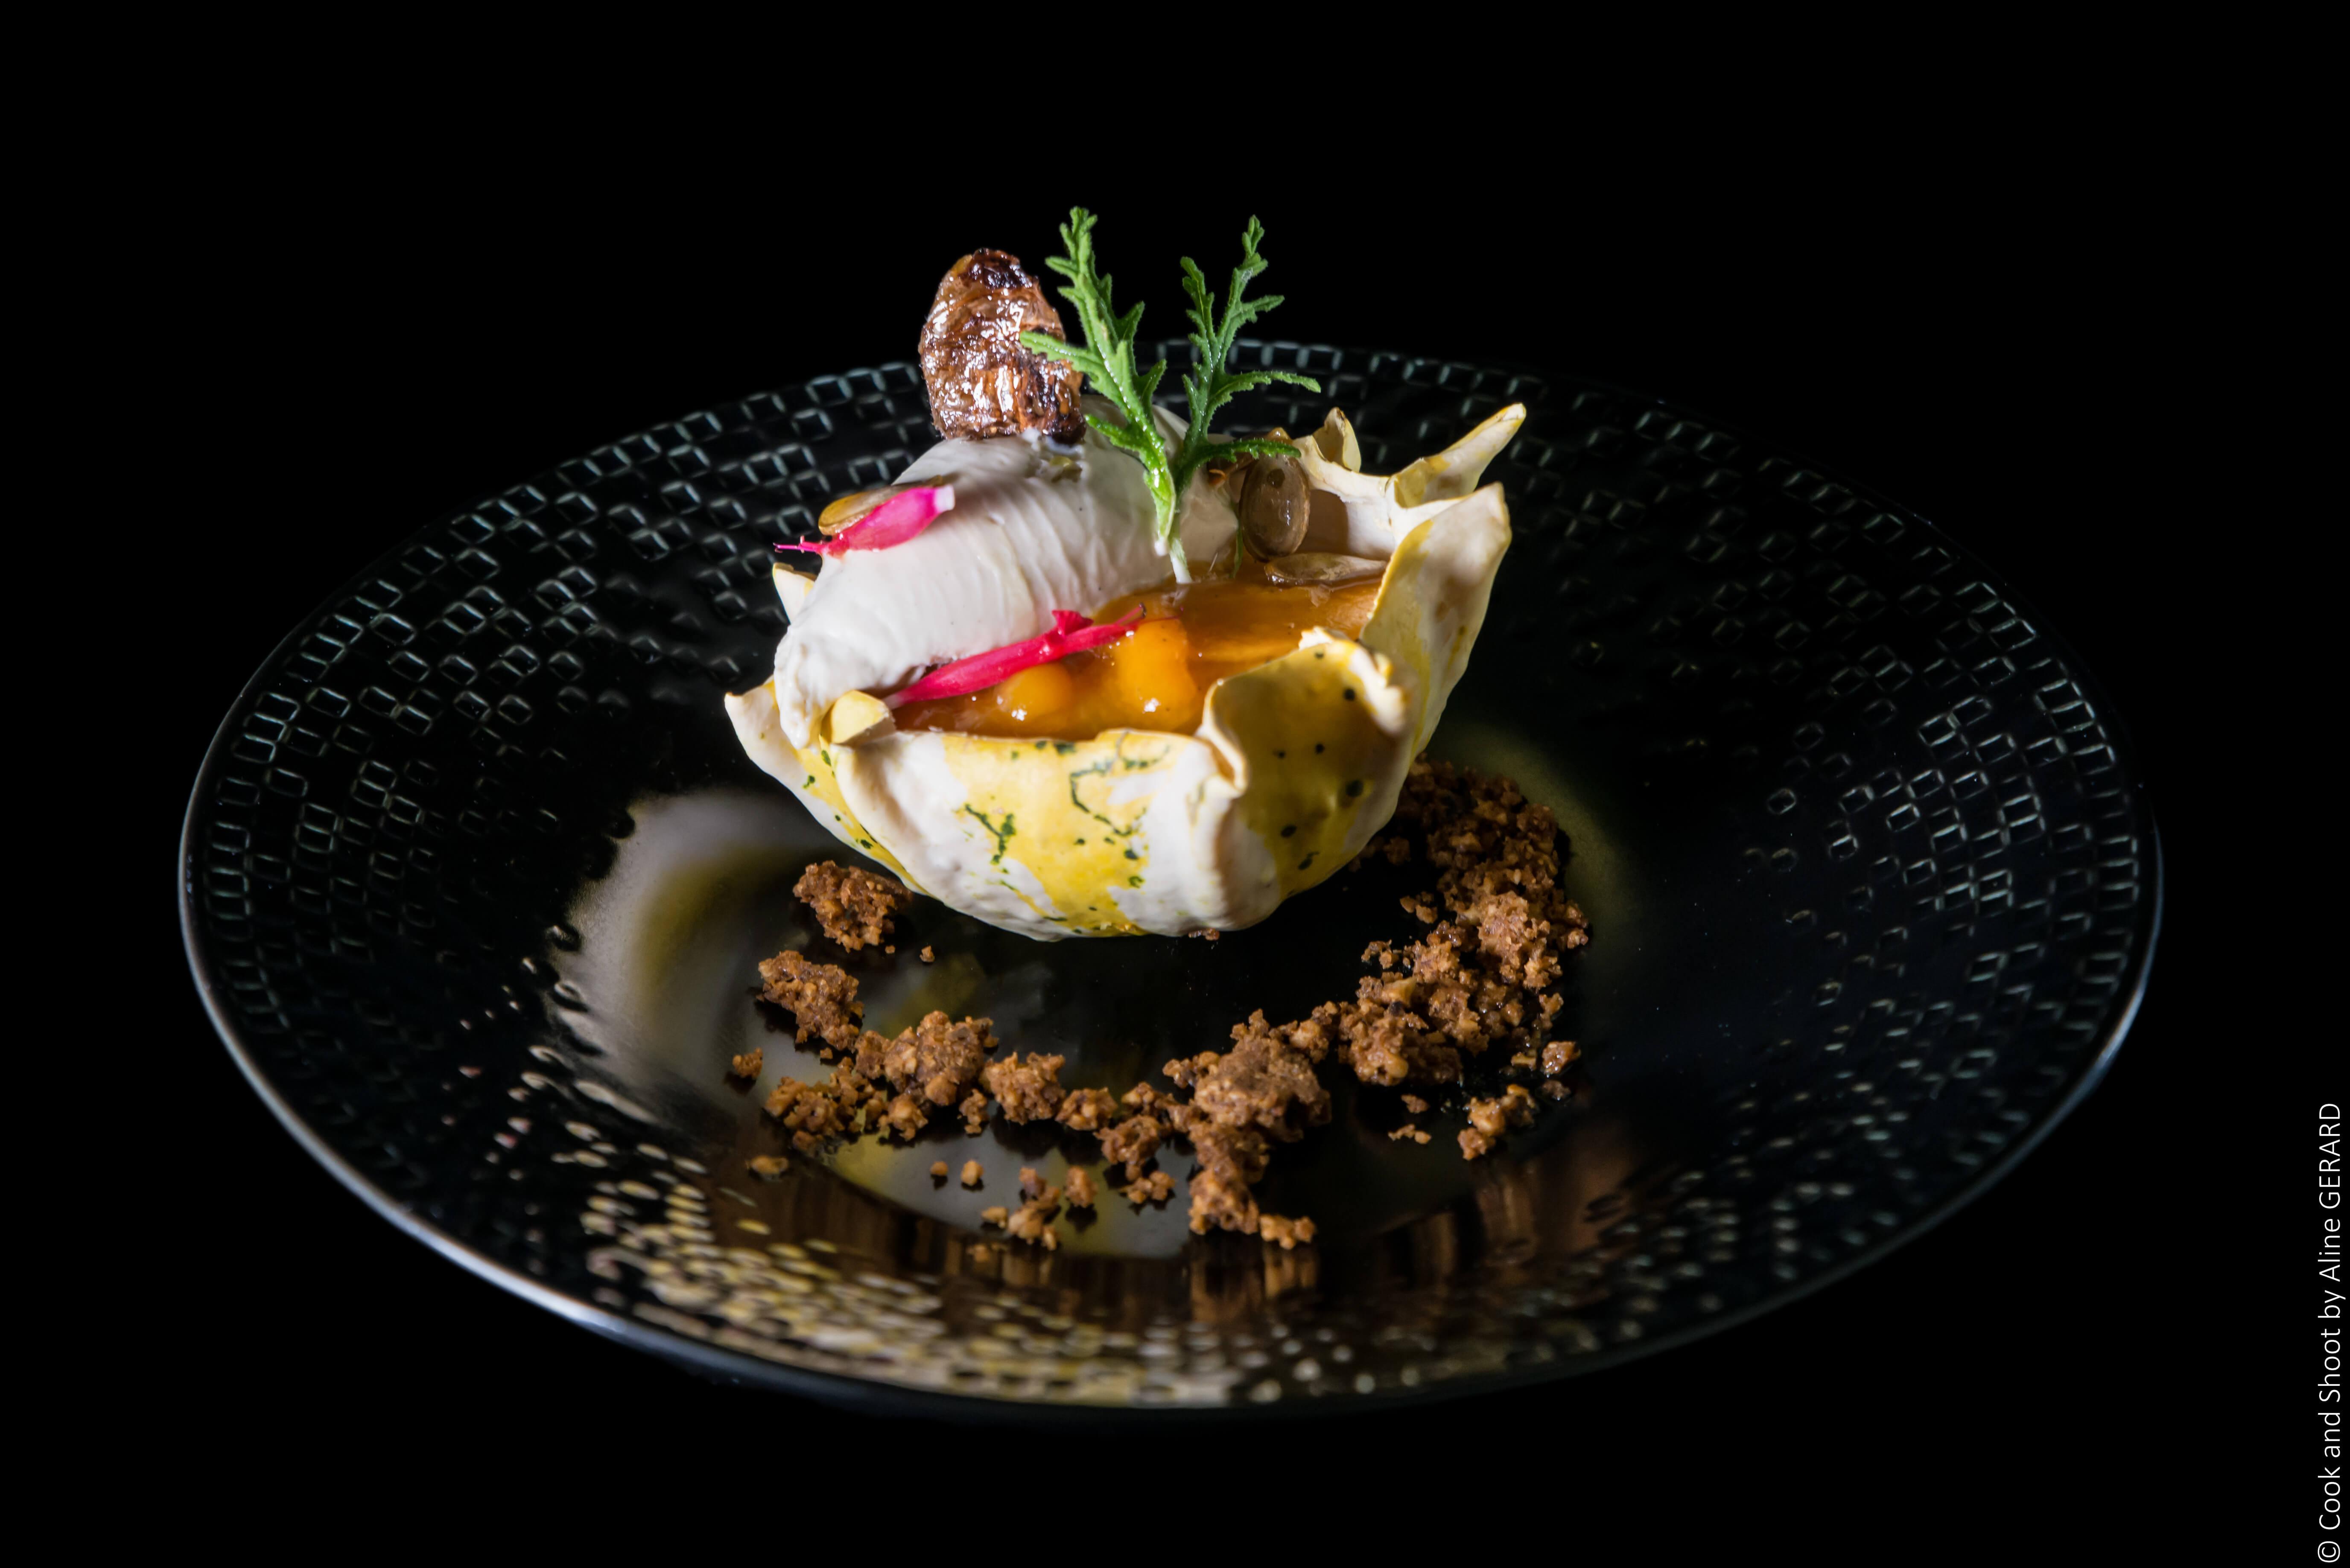 Dessert à l'assiette courge-géranium by Vincent Catala Chef Pâtisser & Cuisnier/French Private Cuisine & Pastry Chef - Catering in Miami